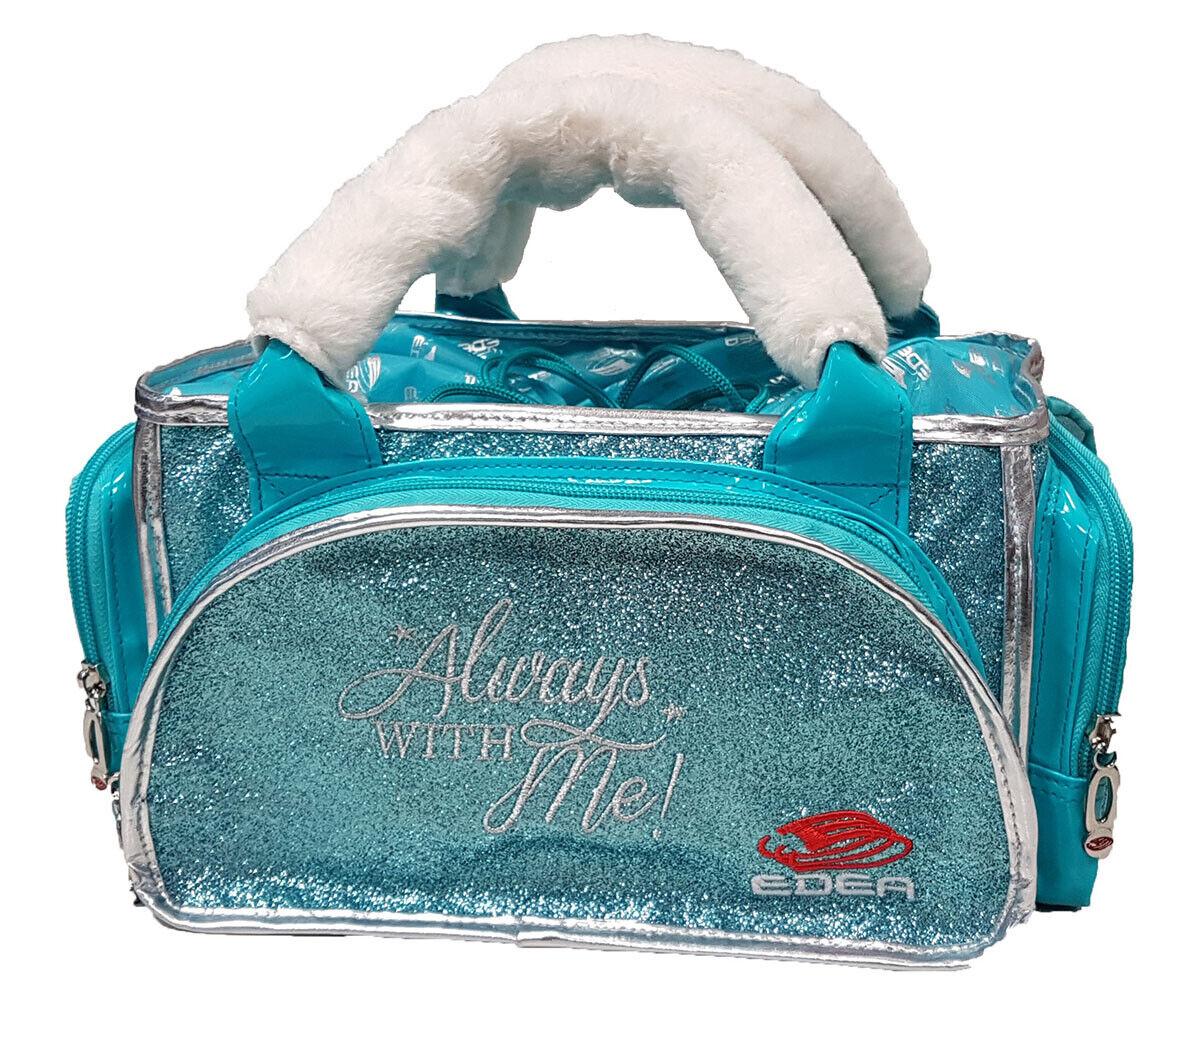 Edea 'With Me' Carry Bag - bluee